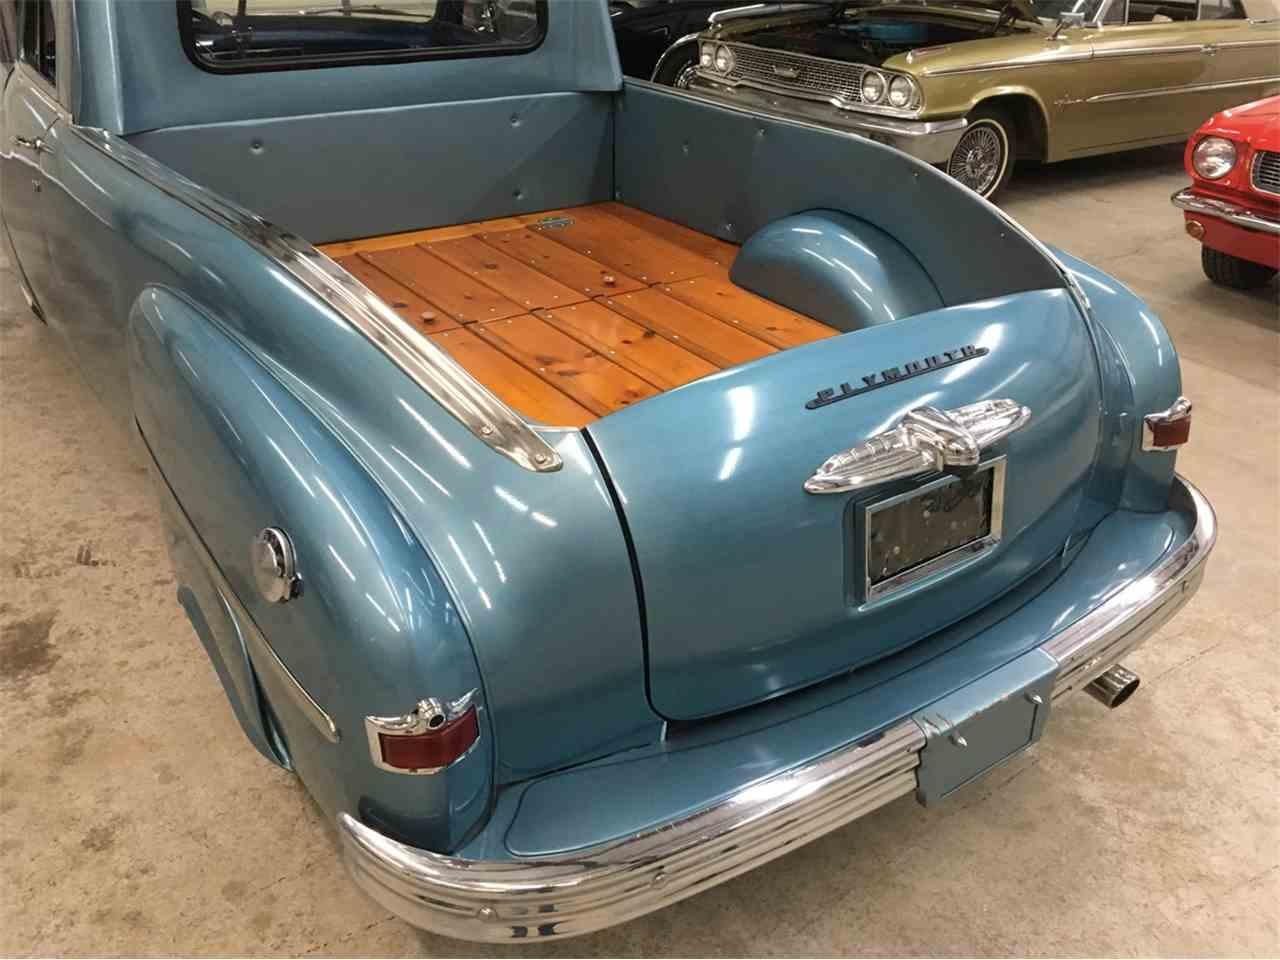 1950 Plymouth Flower Car for Sale | ClassicCars.com | CC-963593